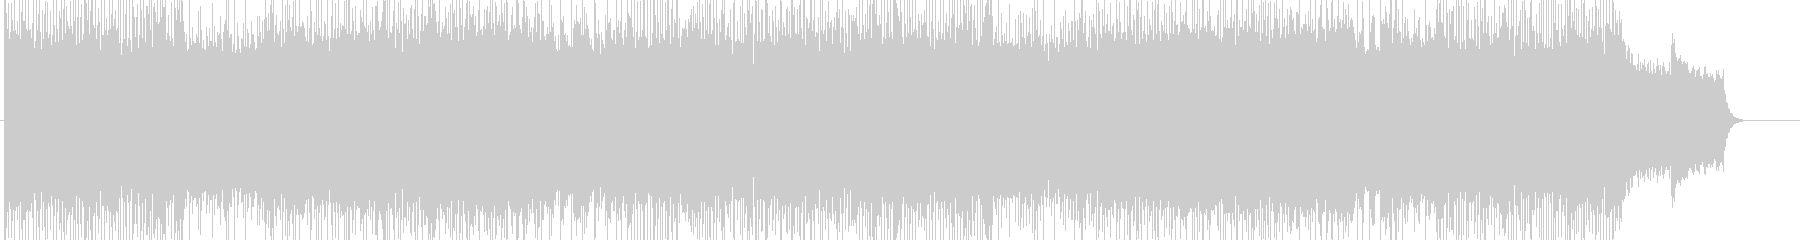 「HR/HM」「ROCK」BGM194の未再生の波形